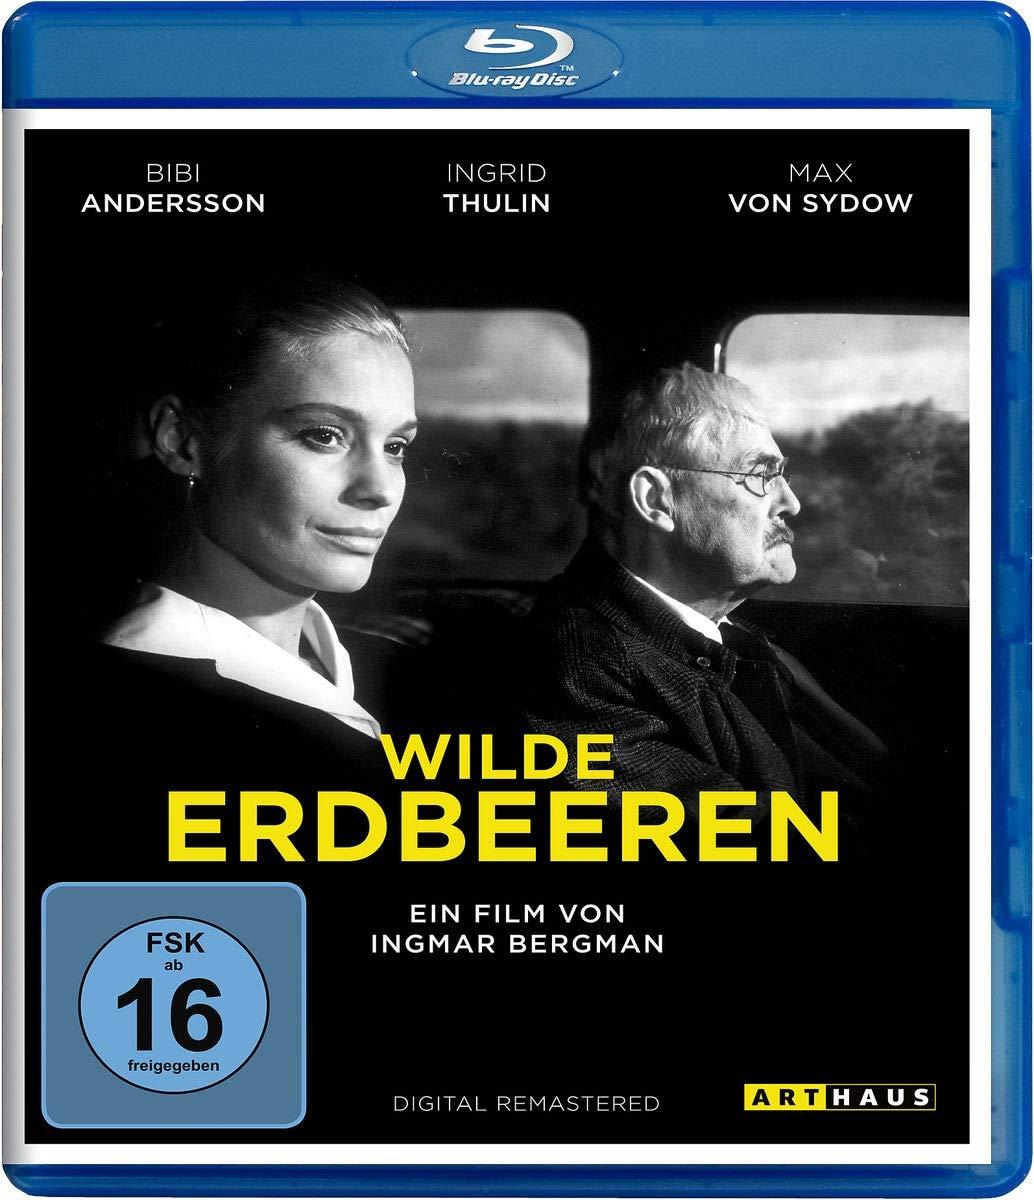 Wilde Erdbeeren - Ingmar Bergman Edition Alemania Blu-ray: Amazon.es: Sjöström, Victor, Anderson, Bibi, Björnstrand, Gunnar, Thulin, Ingrid, von Sydow, Max, Bergman, Ingmar, Sjöström, Victor, Anderson, Bibi: Cine y Series TV